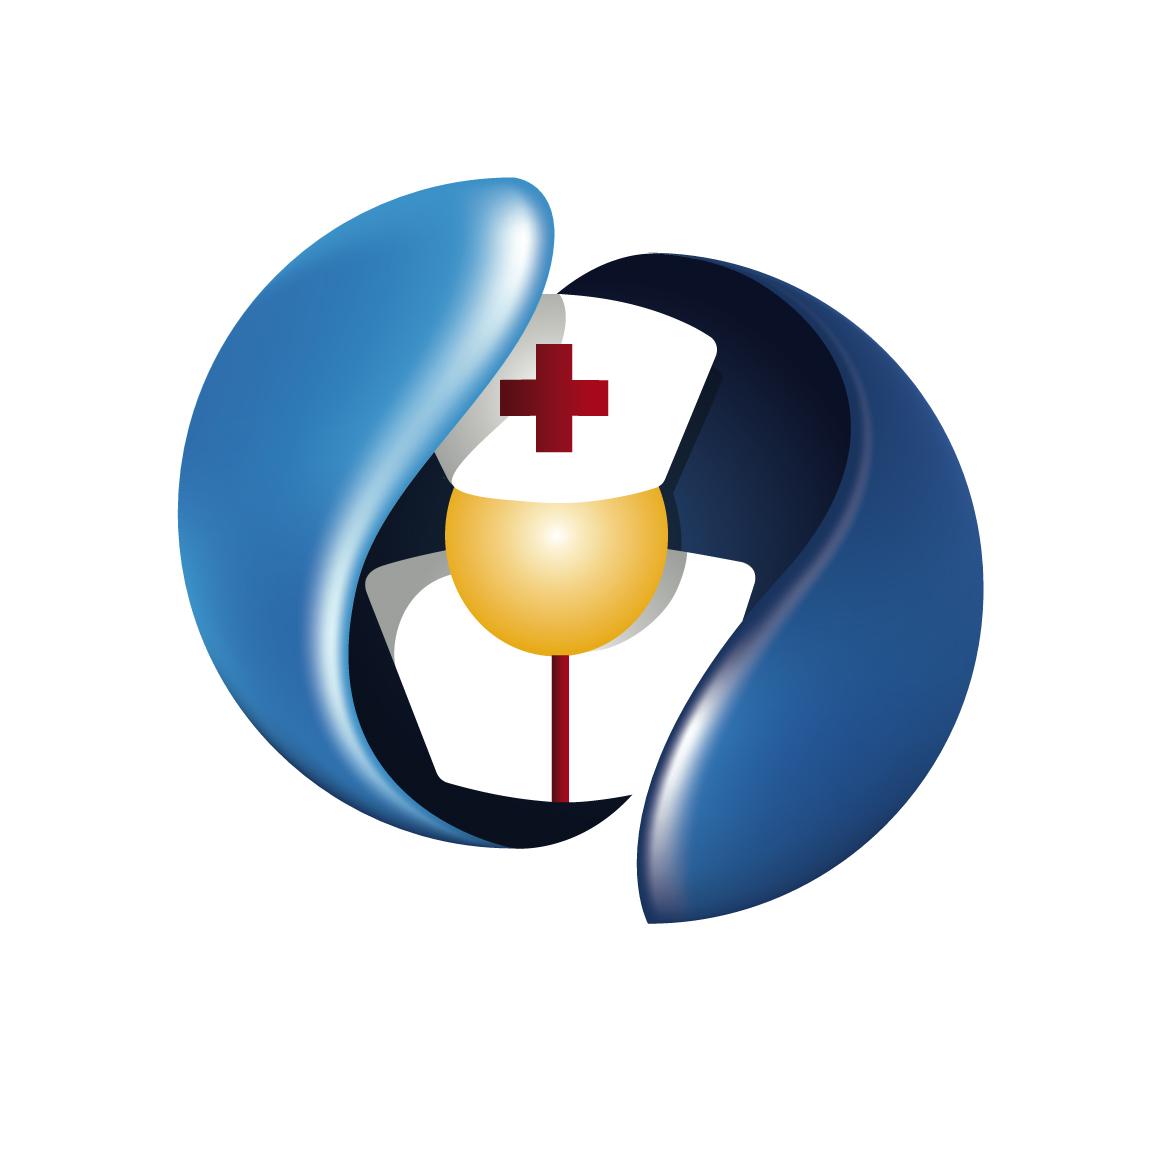 Logo-Bev'-healing-hands-homecare-CNA-services.jpg